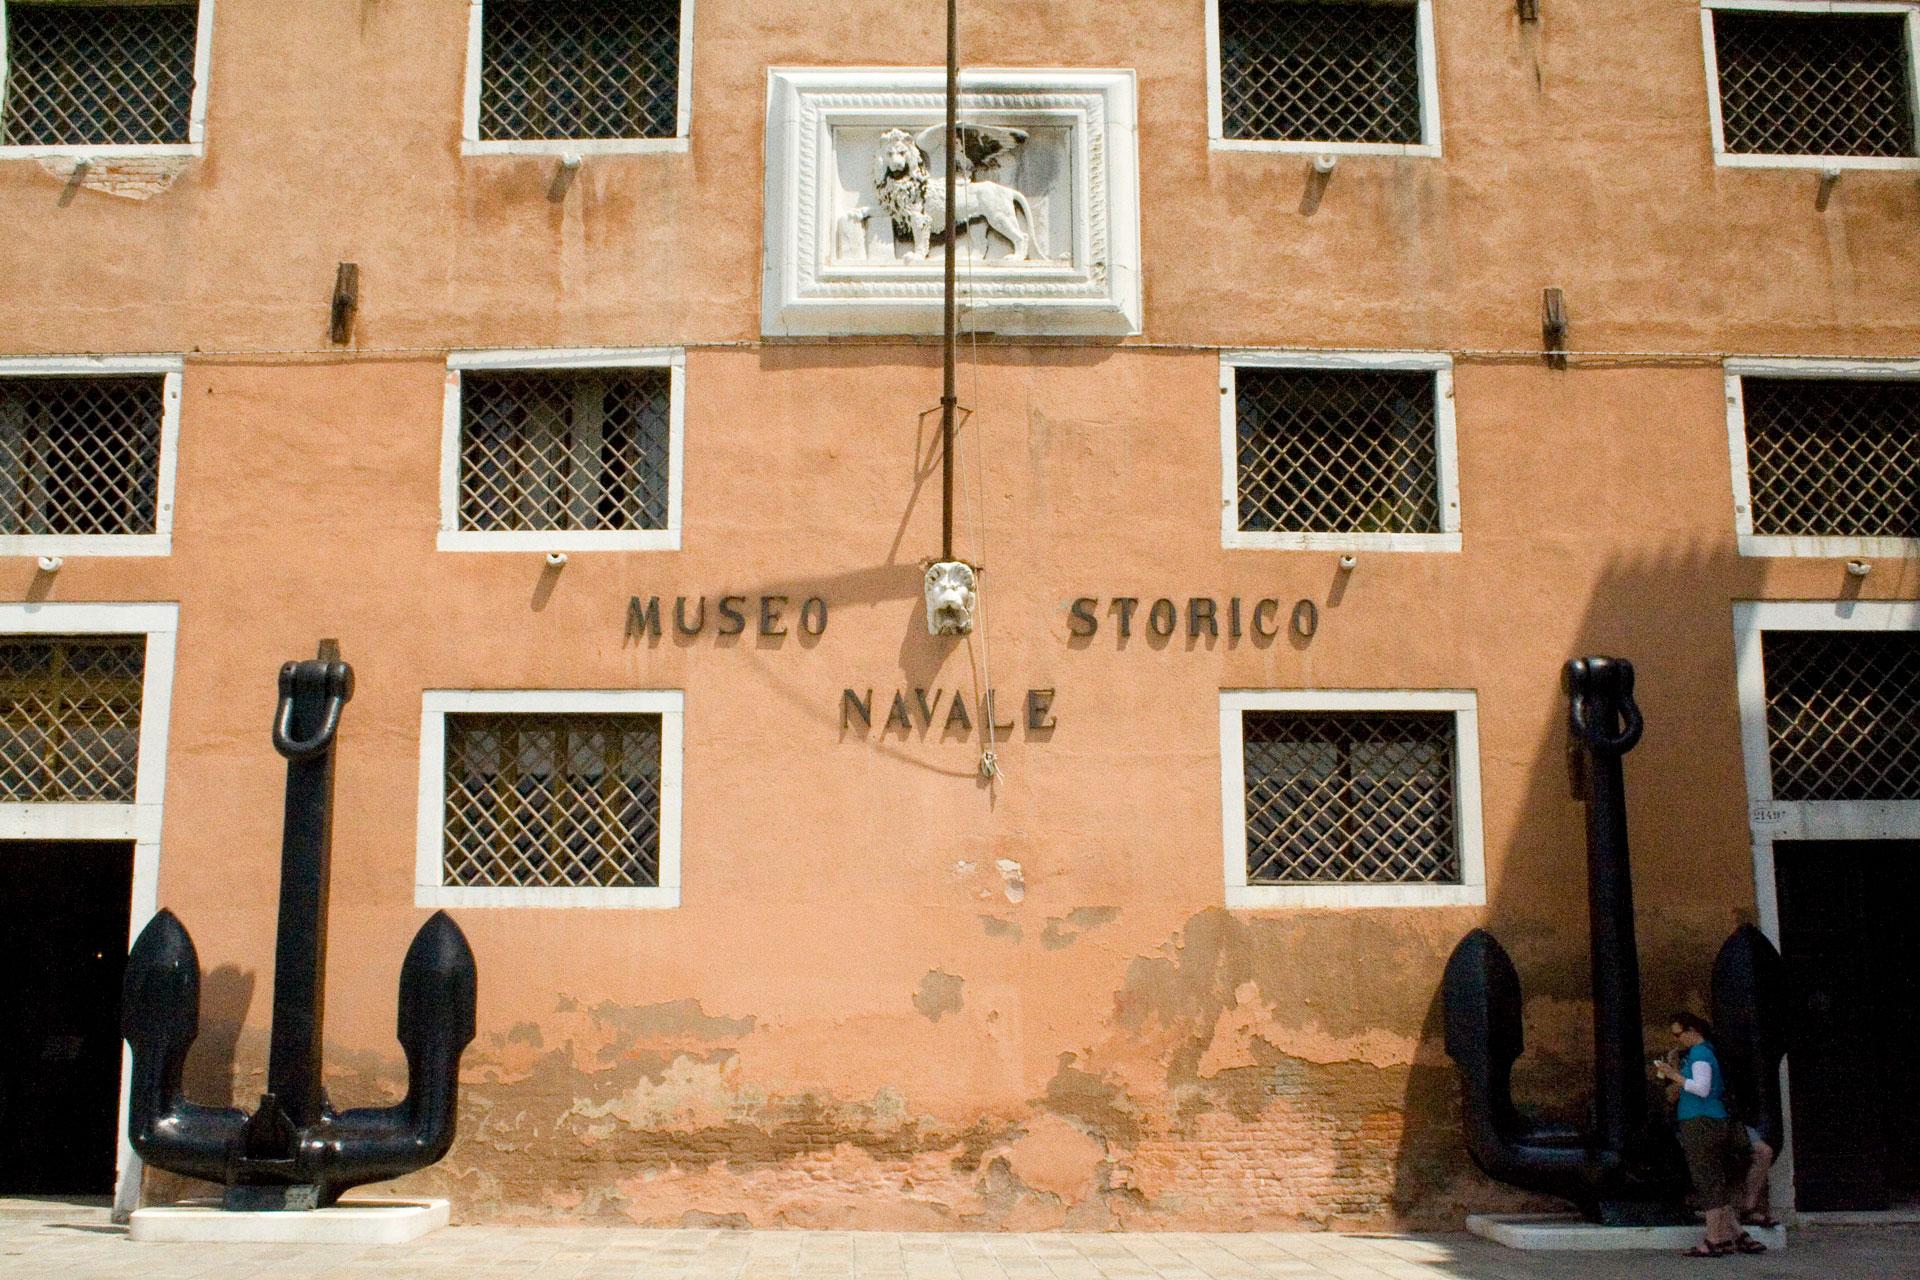 Photograph-by-Miriam-McWilliam-Studio-Mimi-Moon ITALY AMALFI COAST POSITANO SORRENTO ROME FINE ART PHOTOGRAPHIC PRINT